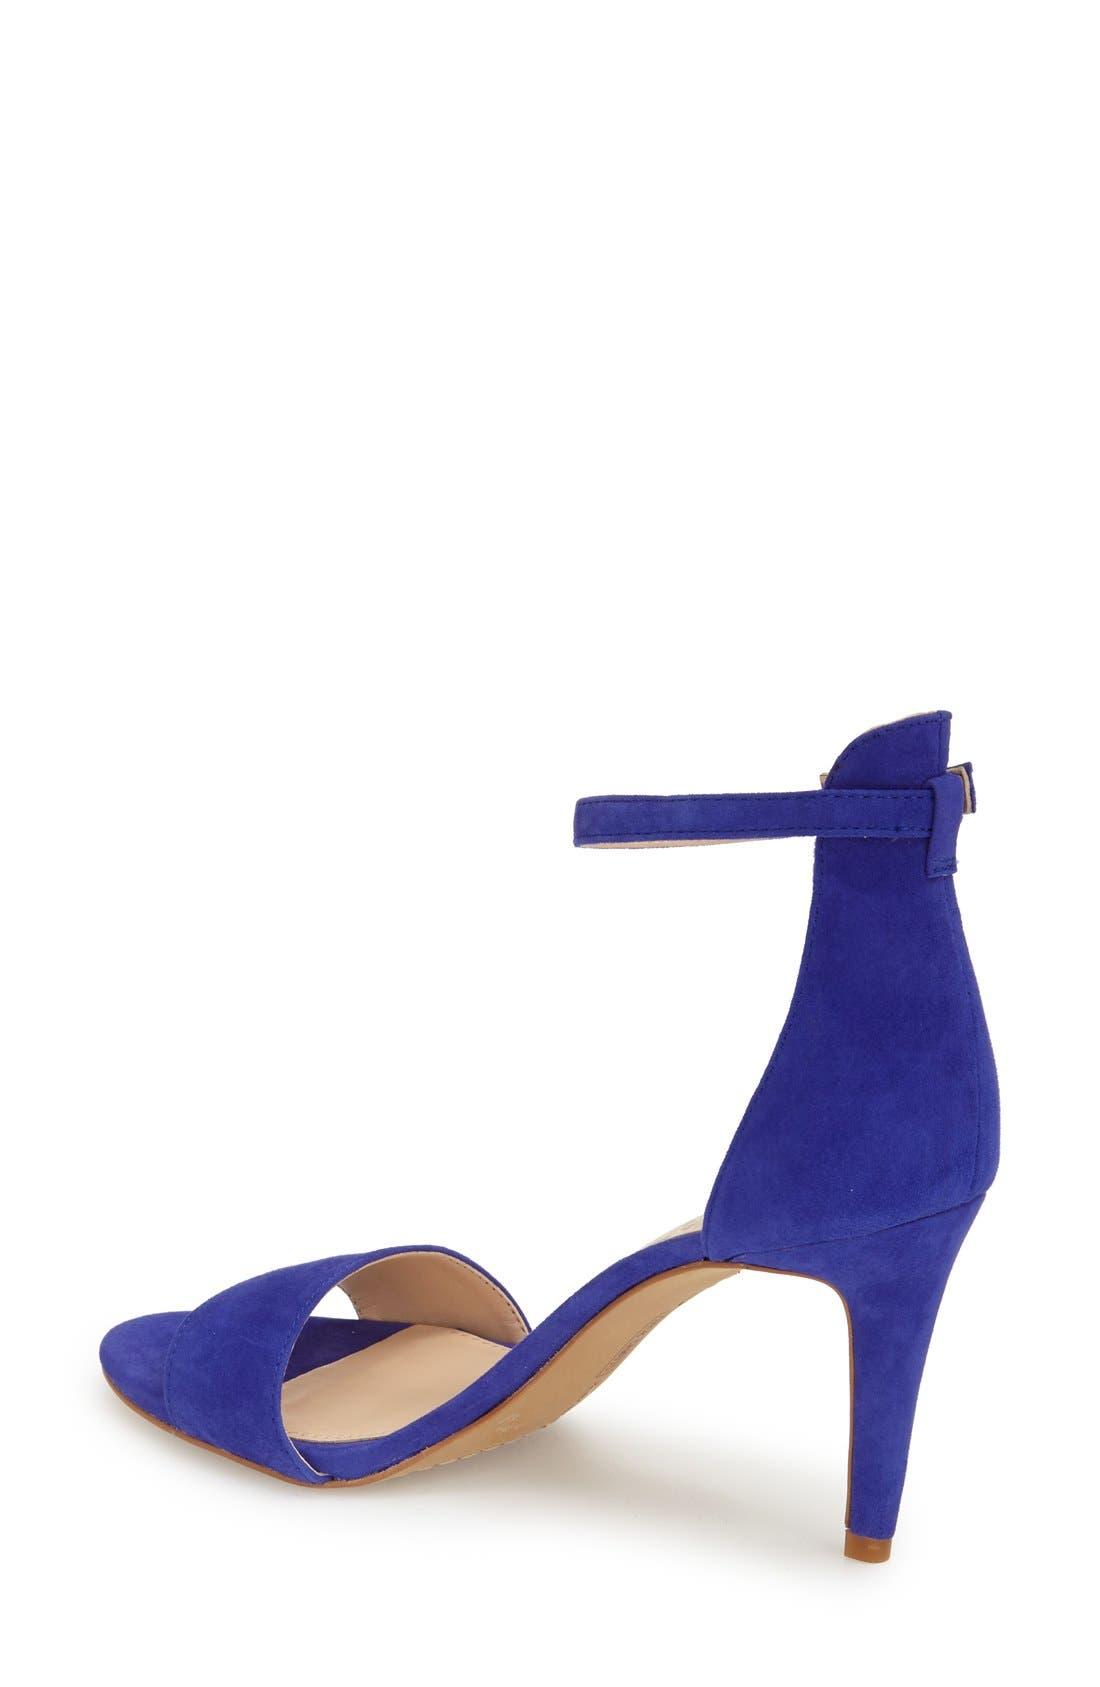 ,                             'Court' Ankle Strap Sandal,                             Alternate thumbnail 70, color,                             461